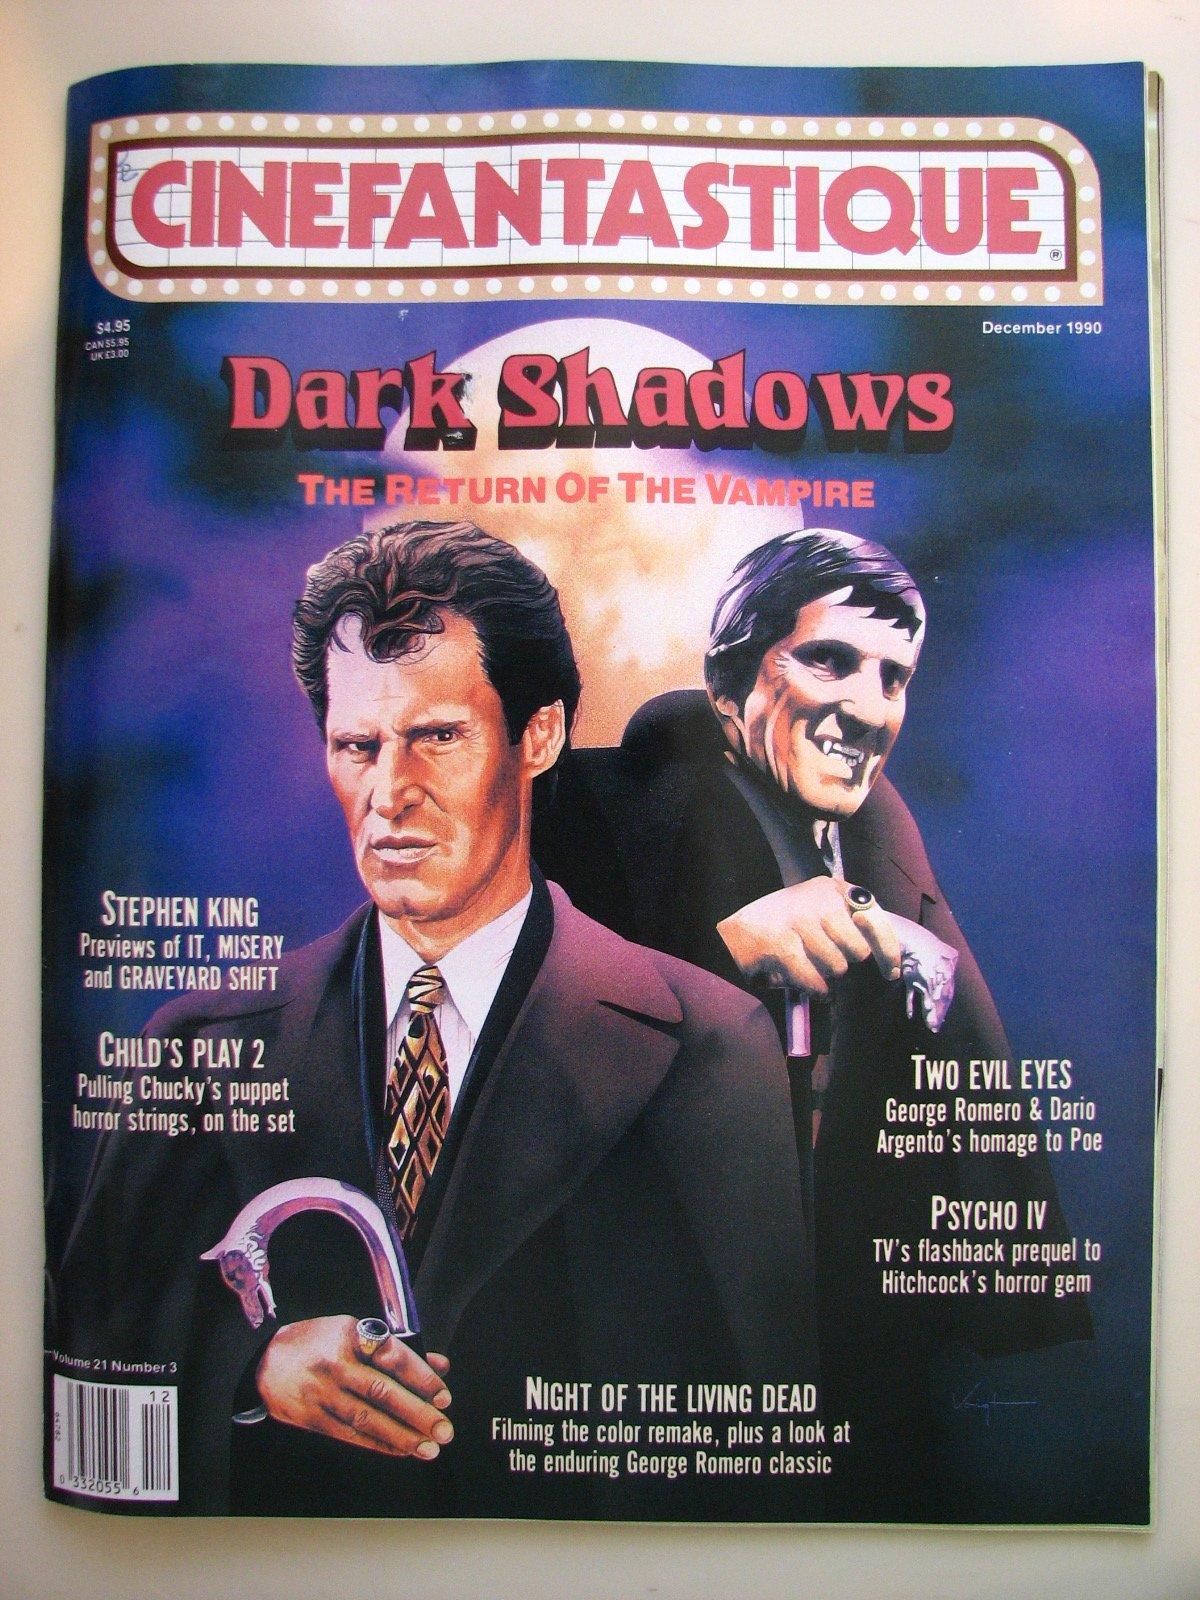 Cinefantastique Vol  21 #3 / Dark Shadows, Psycho IV